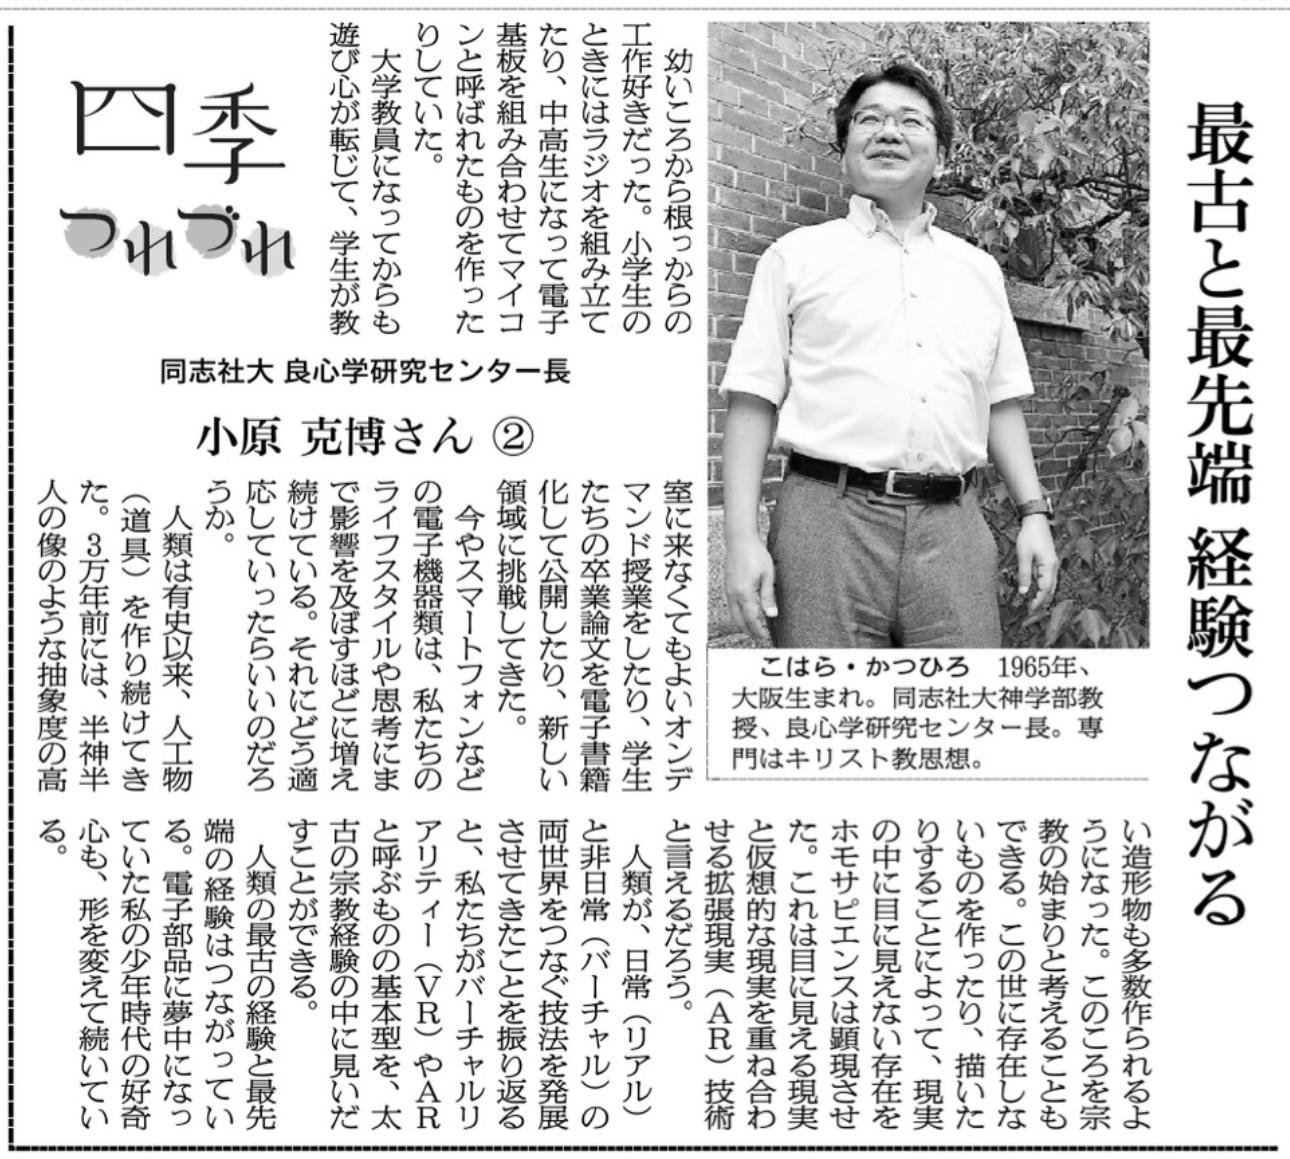 http://www.kohara.ac/essays/Asahi20181003m.png